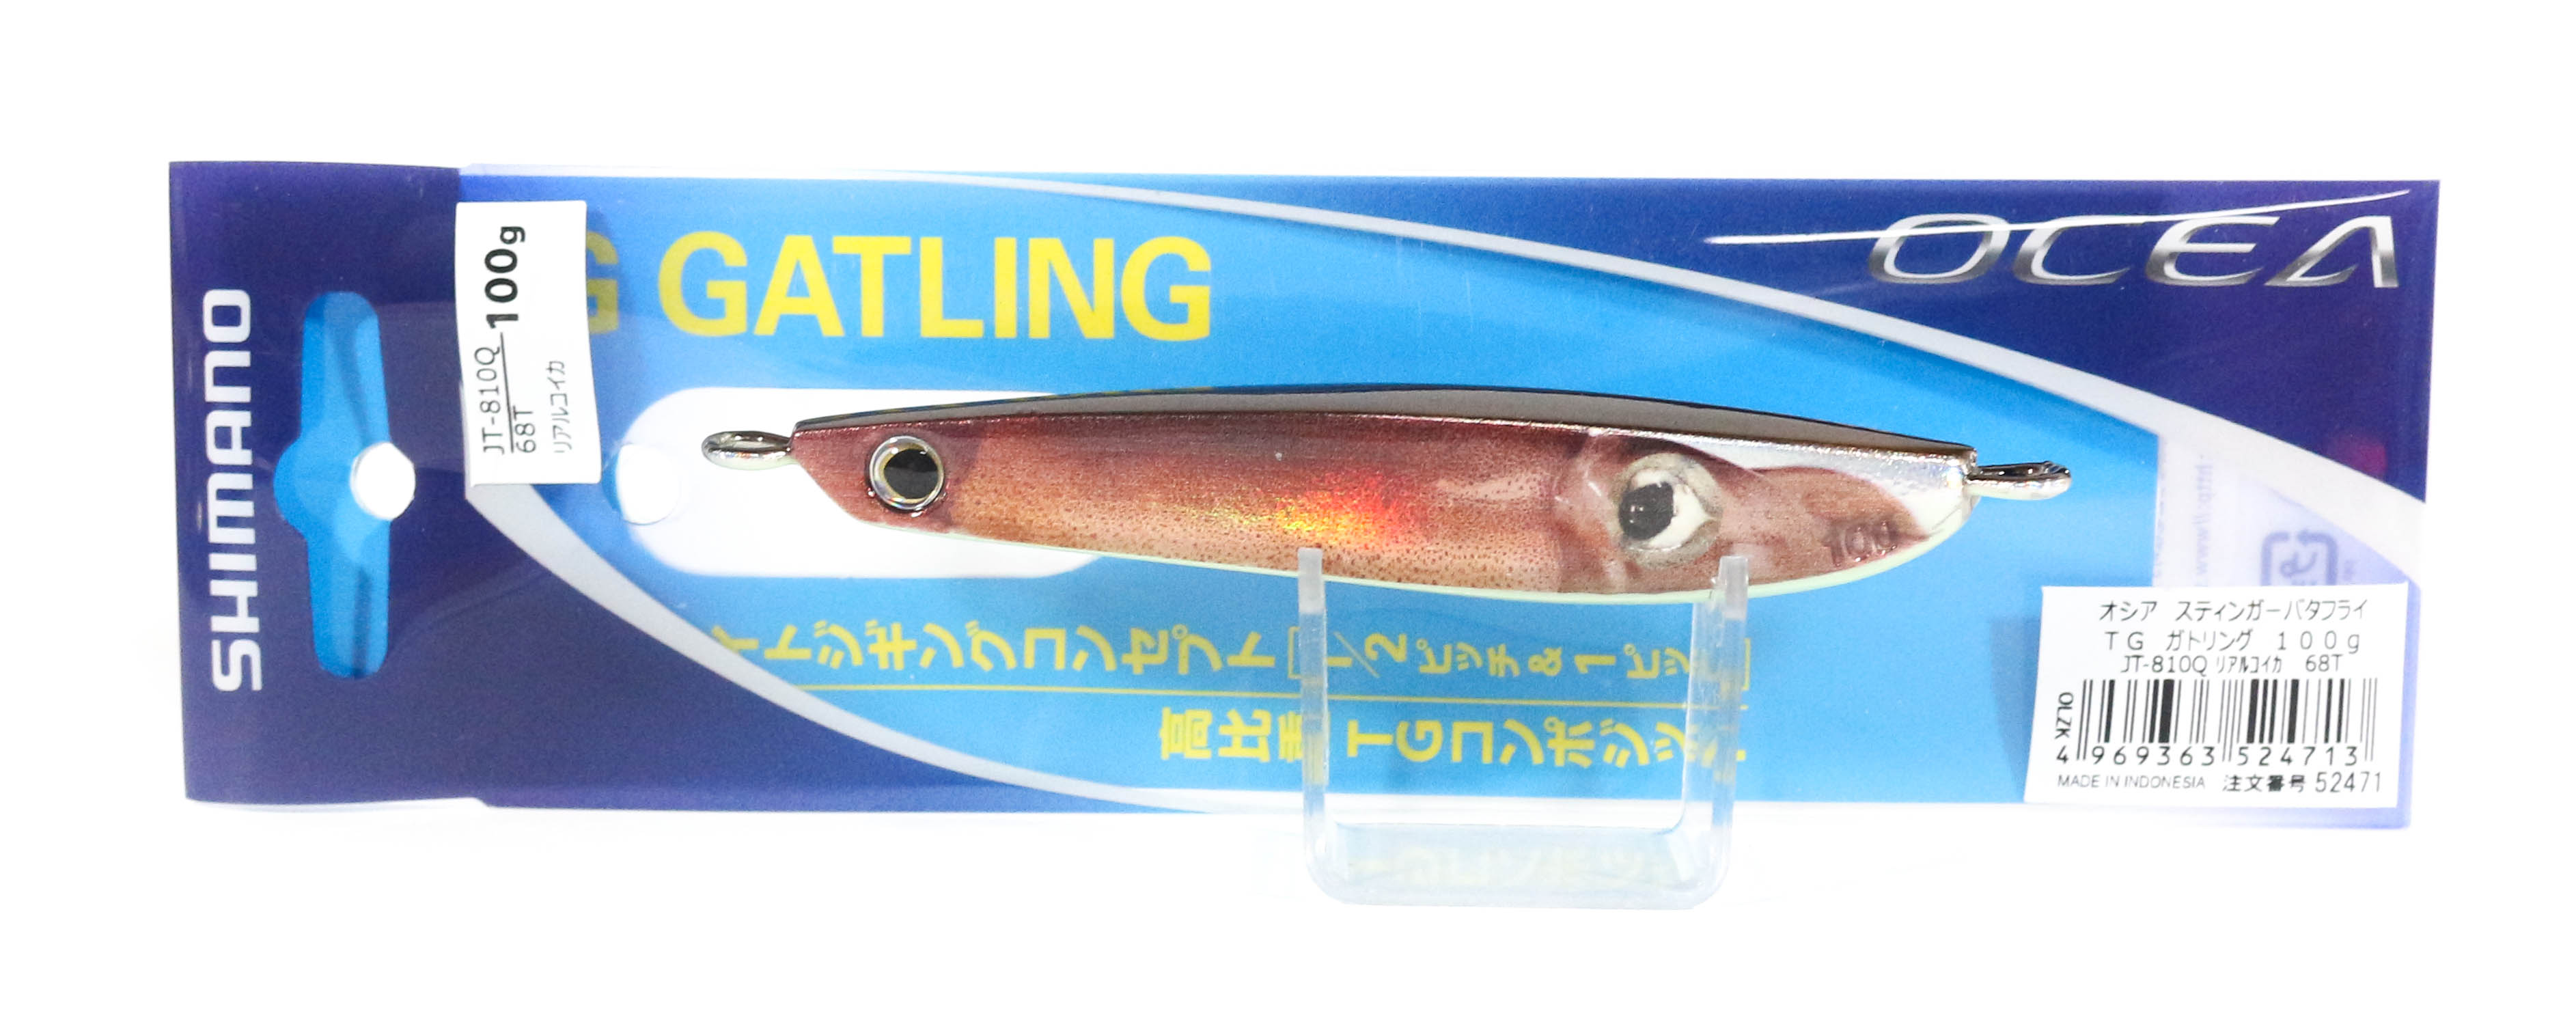 Shimano JT-810Q Metal Jig TG Gatling 100 grams 68T 524713